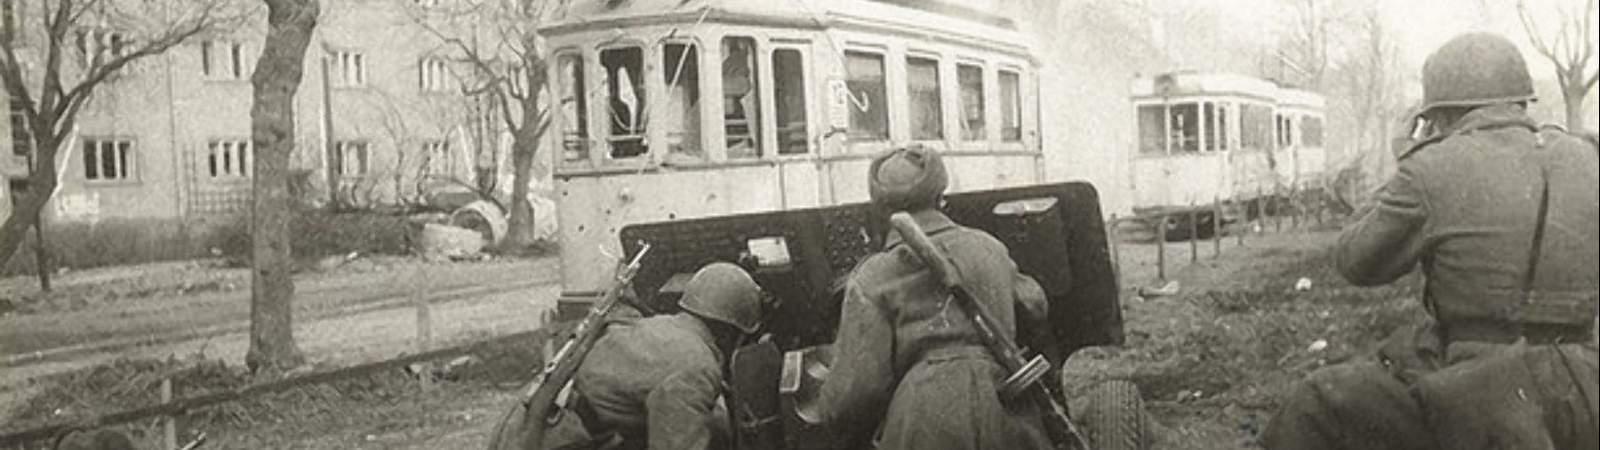 Артиллеристы 1945-го